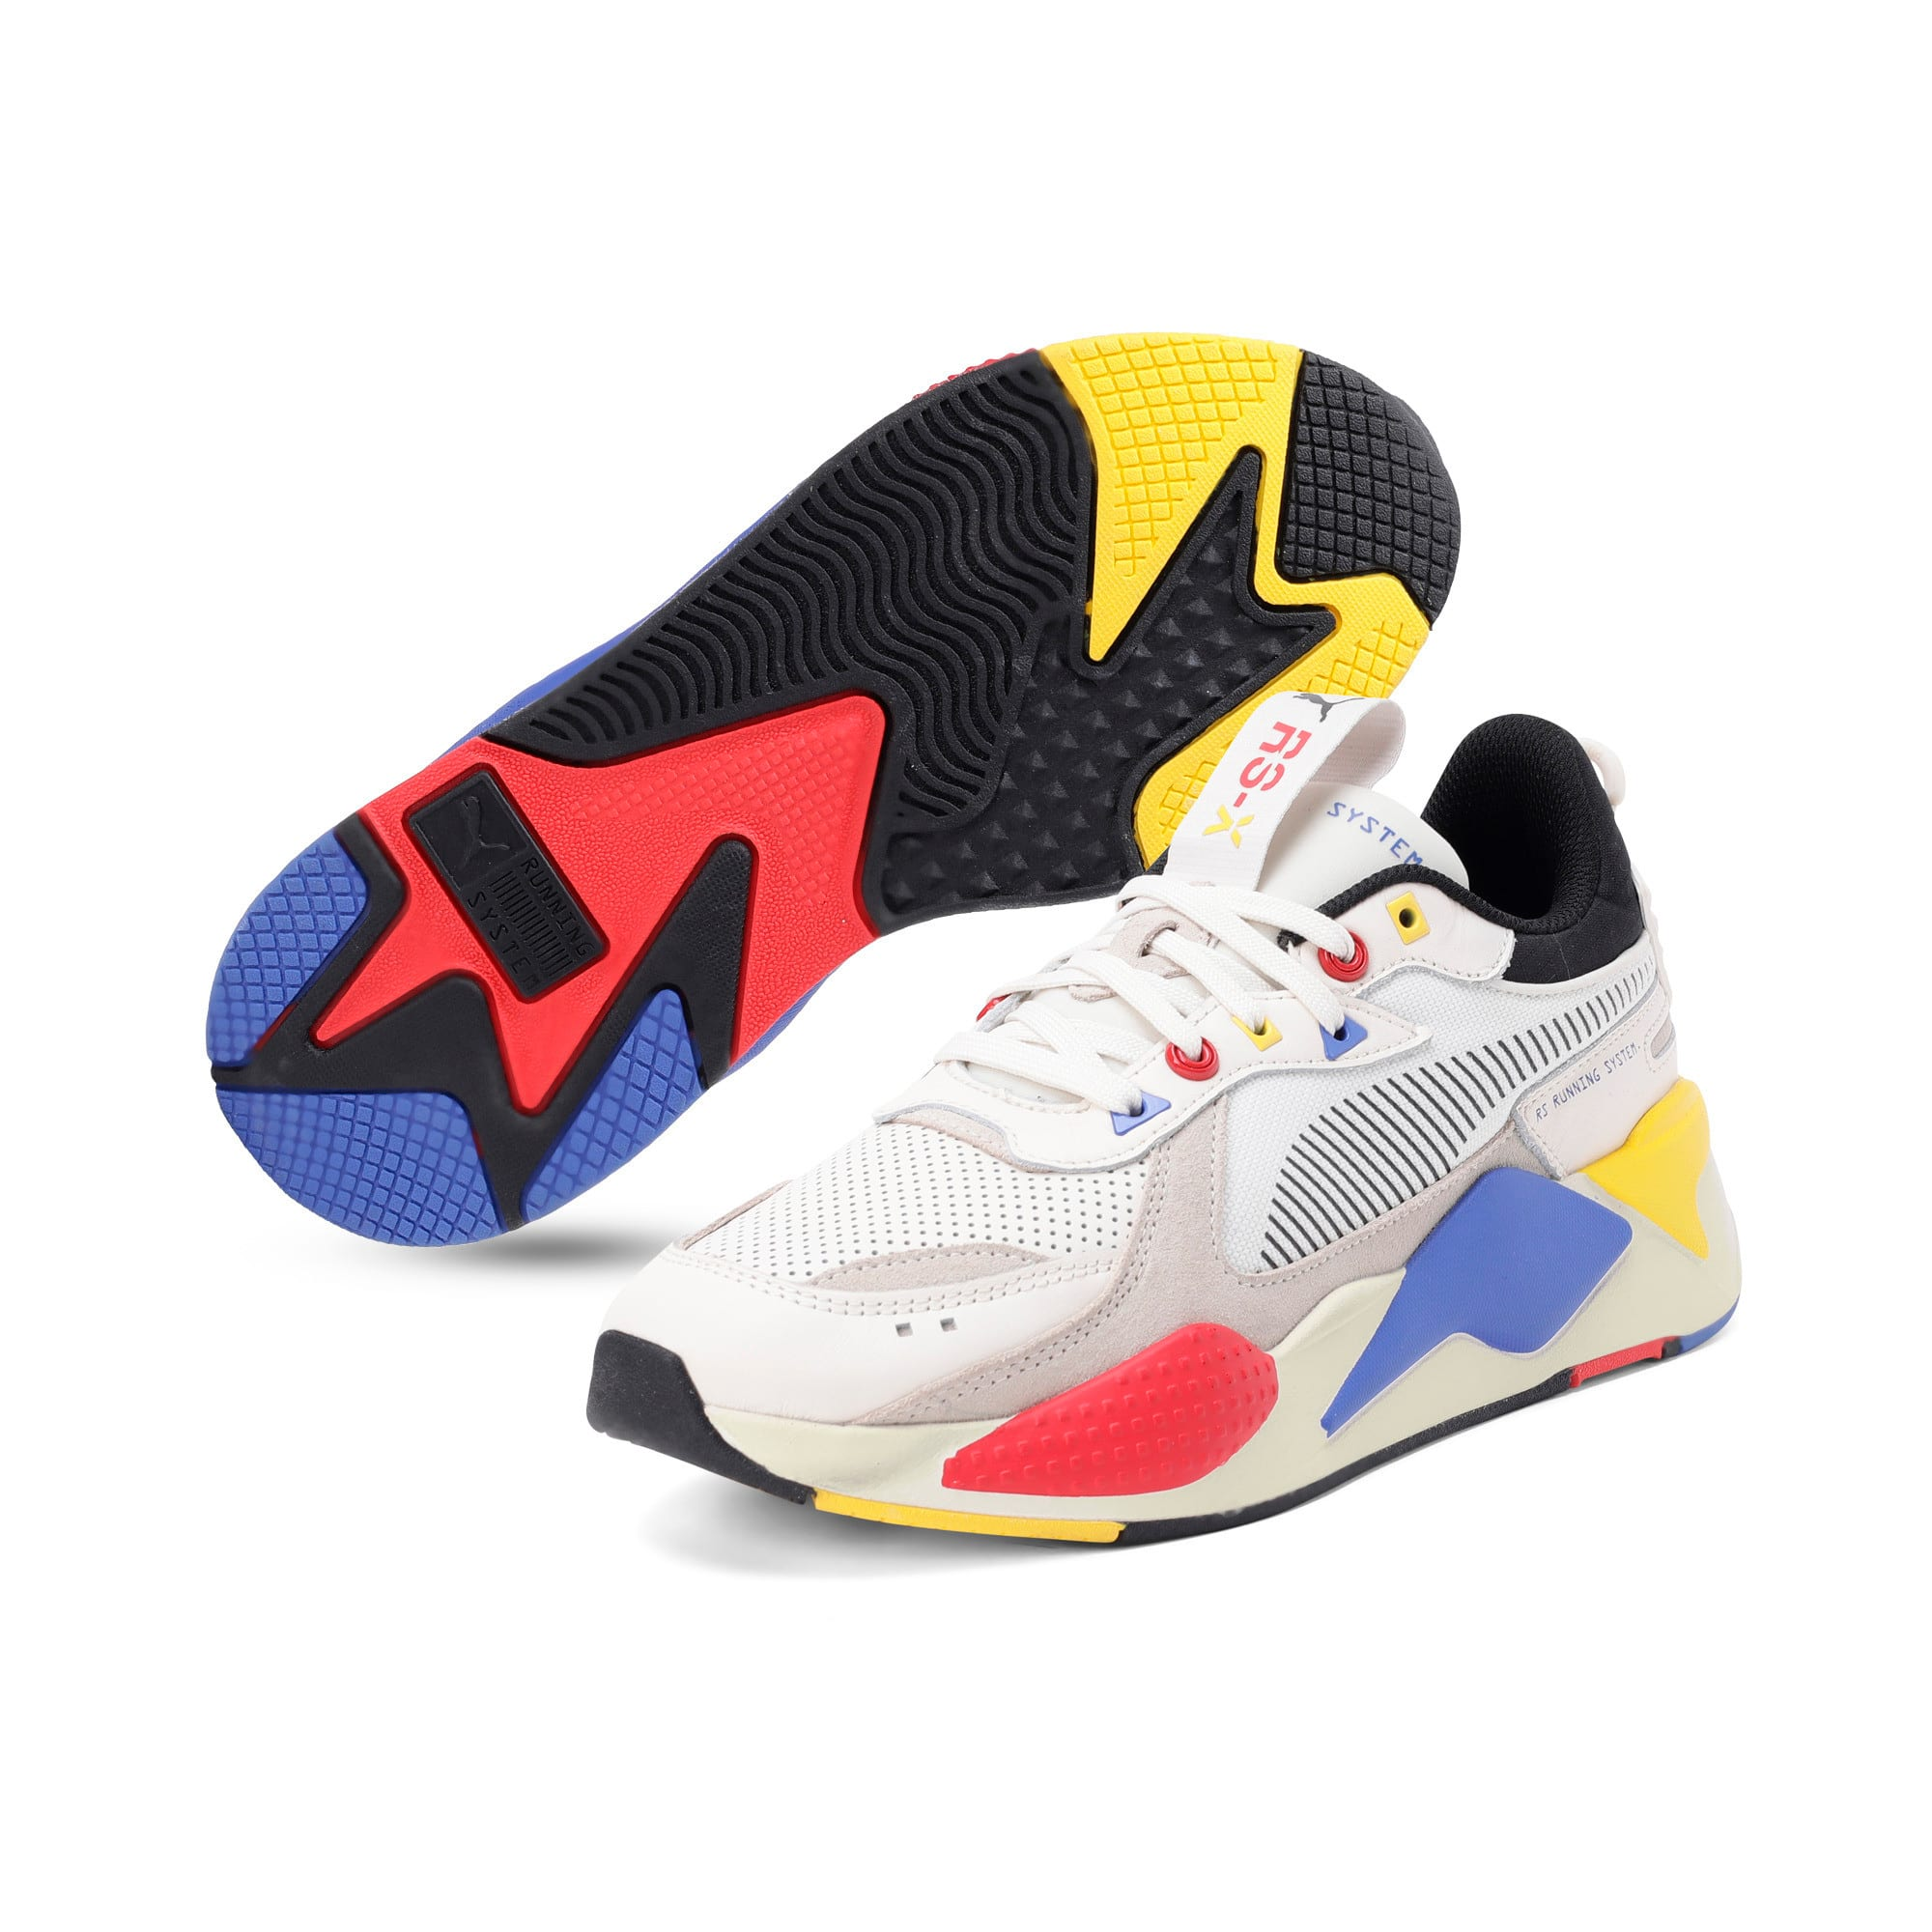 Thumbnail 4 of RS-X Colour Theory Trainers, Whisper White-Puma Black, medium-IND